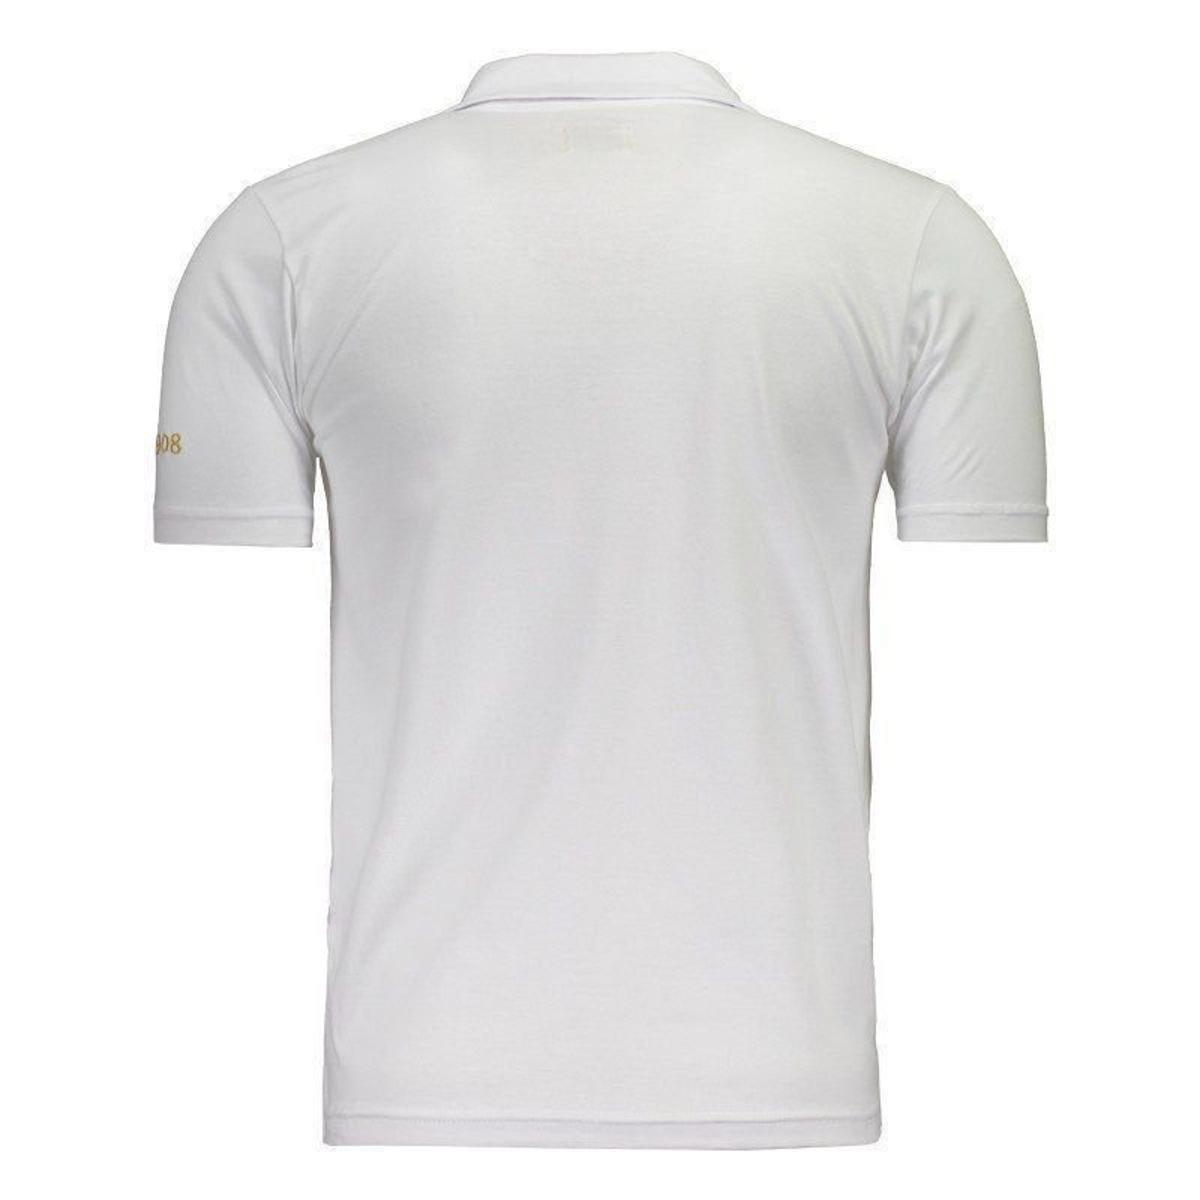 22caee9d15 Camisa Retrômania Fluminense Away 1908 Masculina - Branco - Compre ...